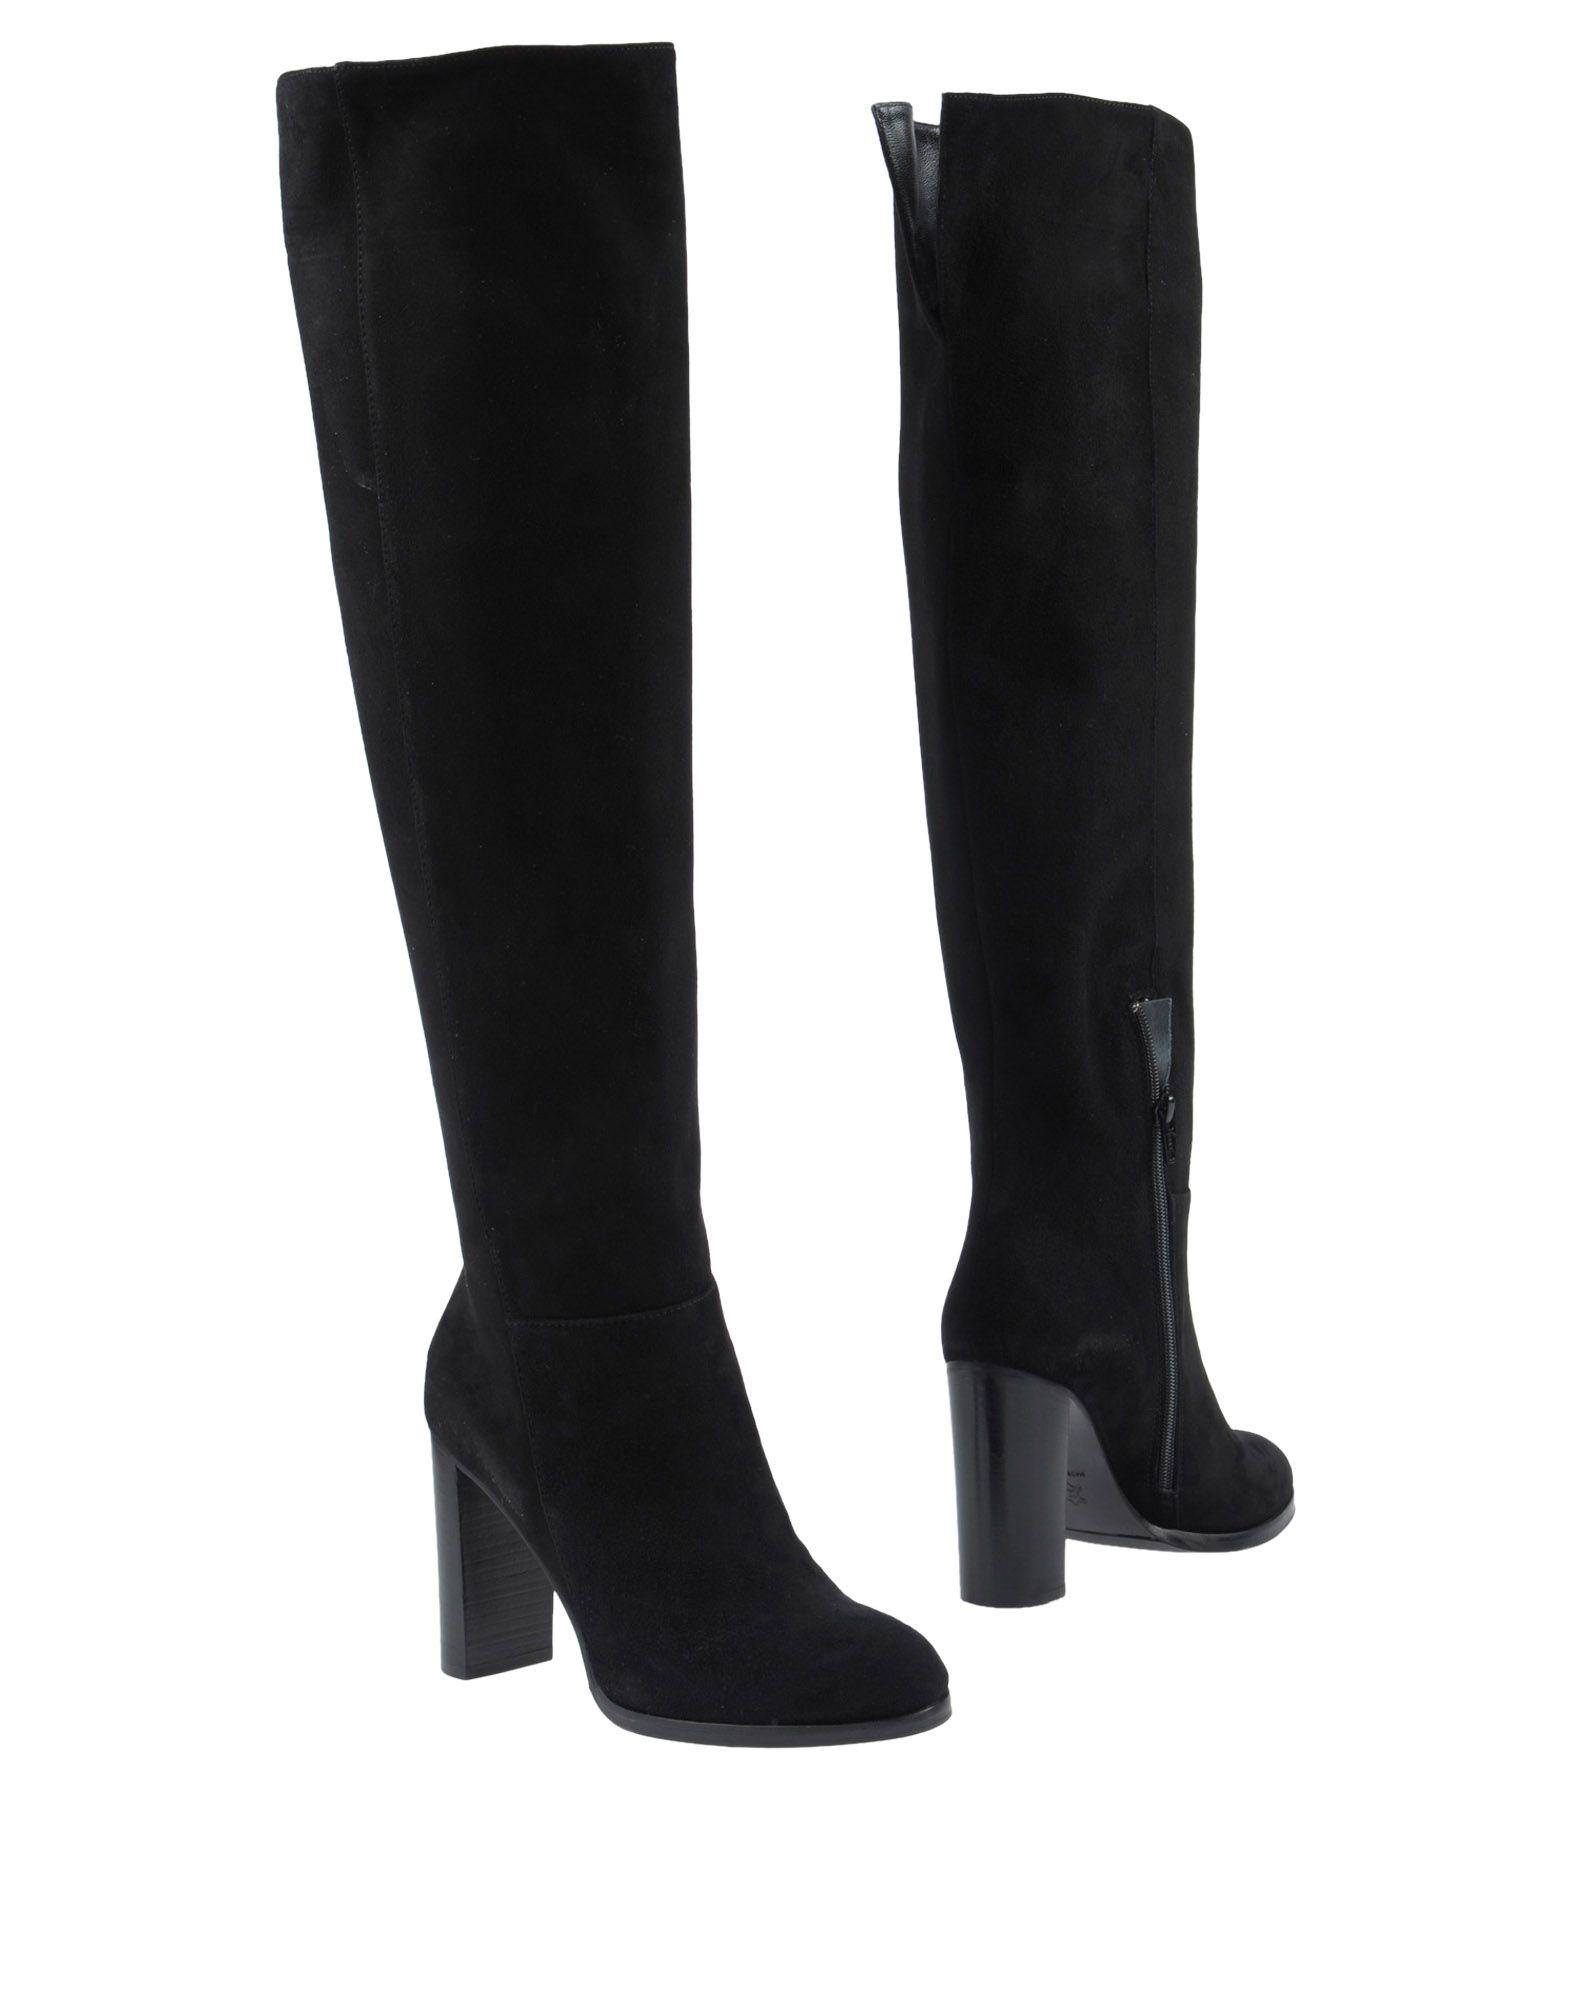 Spaziomoda Boots - Women Spaziomoda Canada Boots online on  Canada Spaziomoda - 11448280QN 825bbd